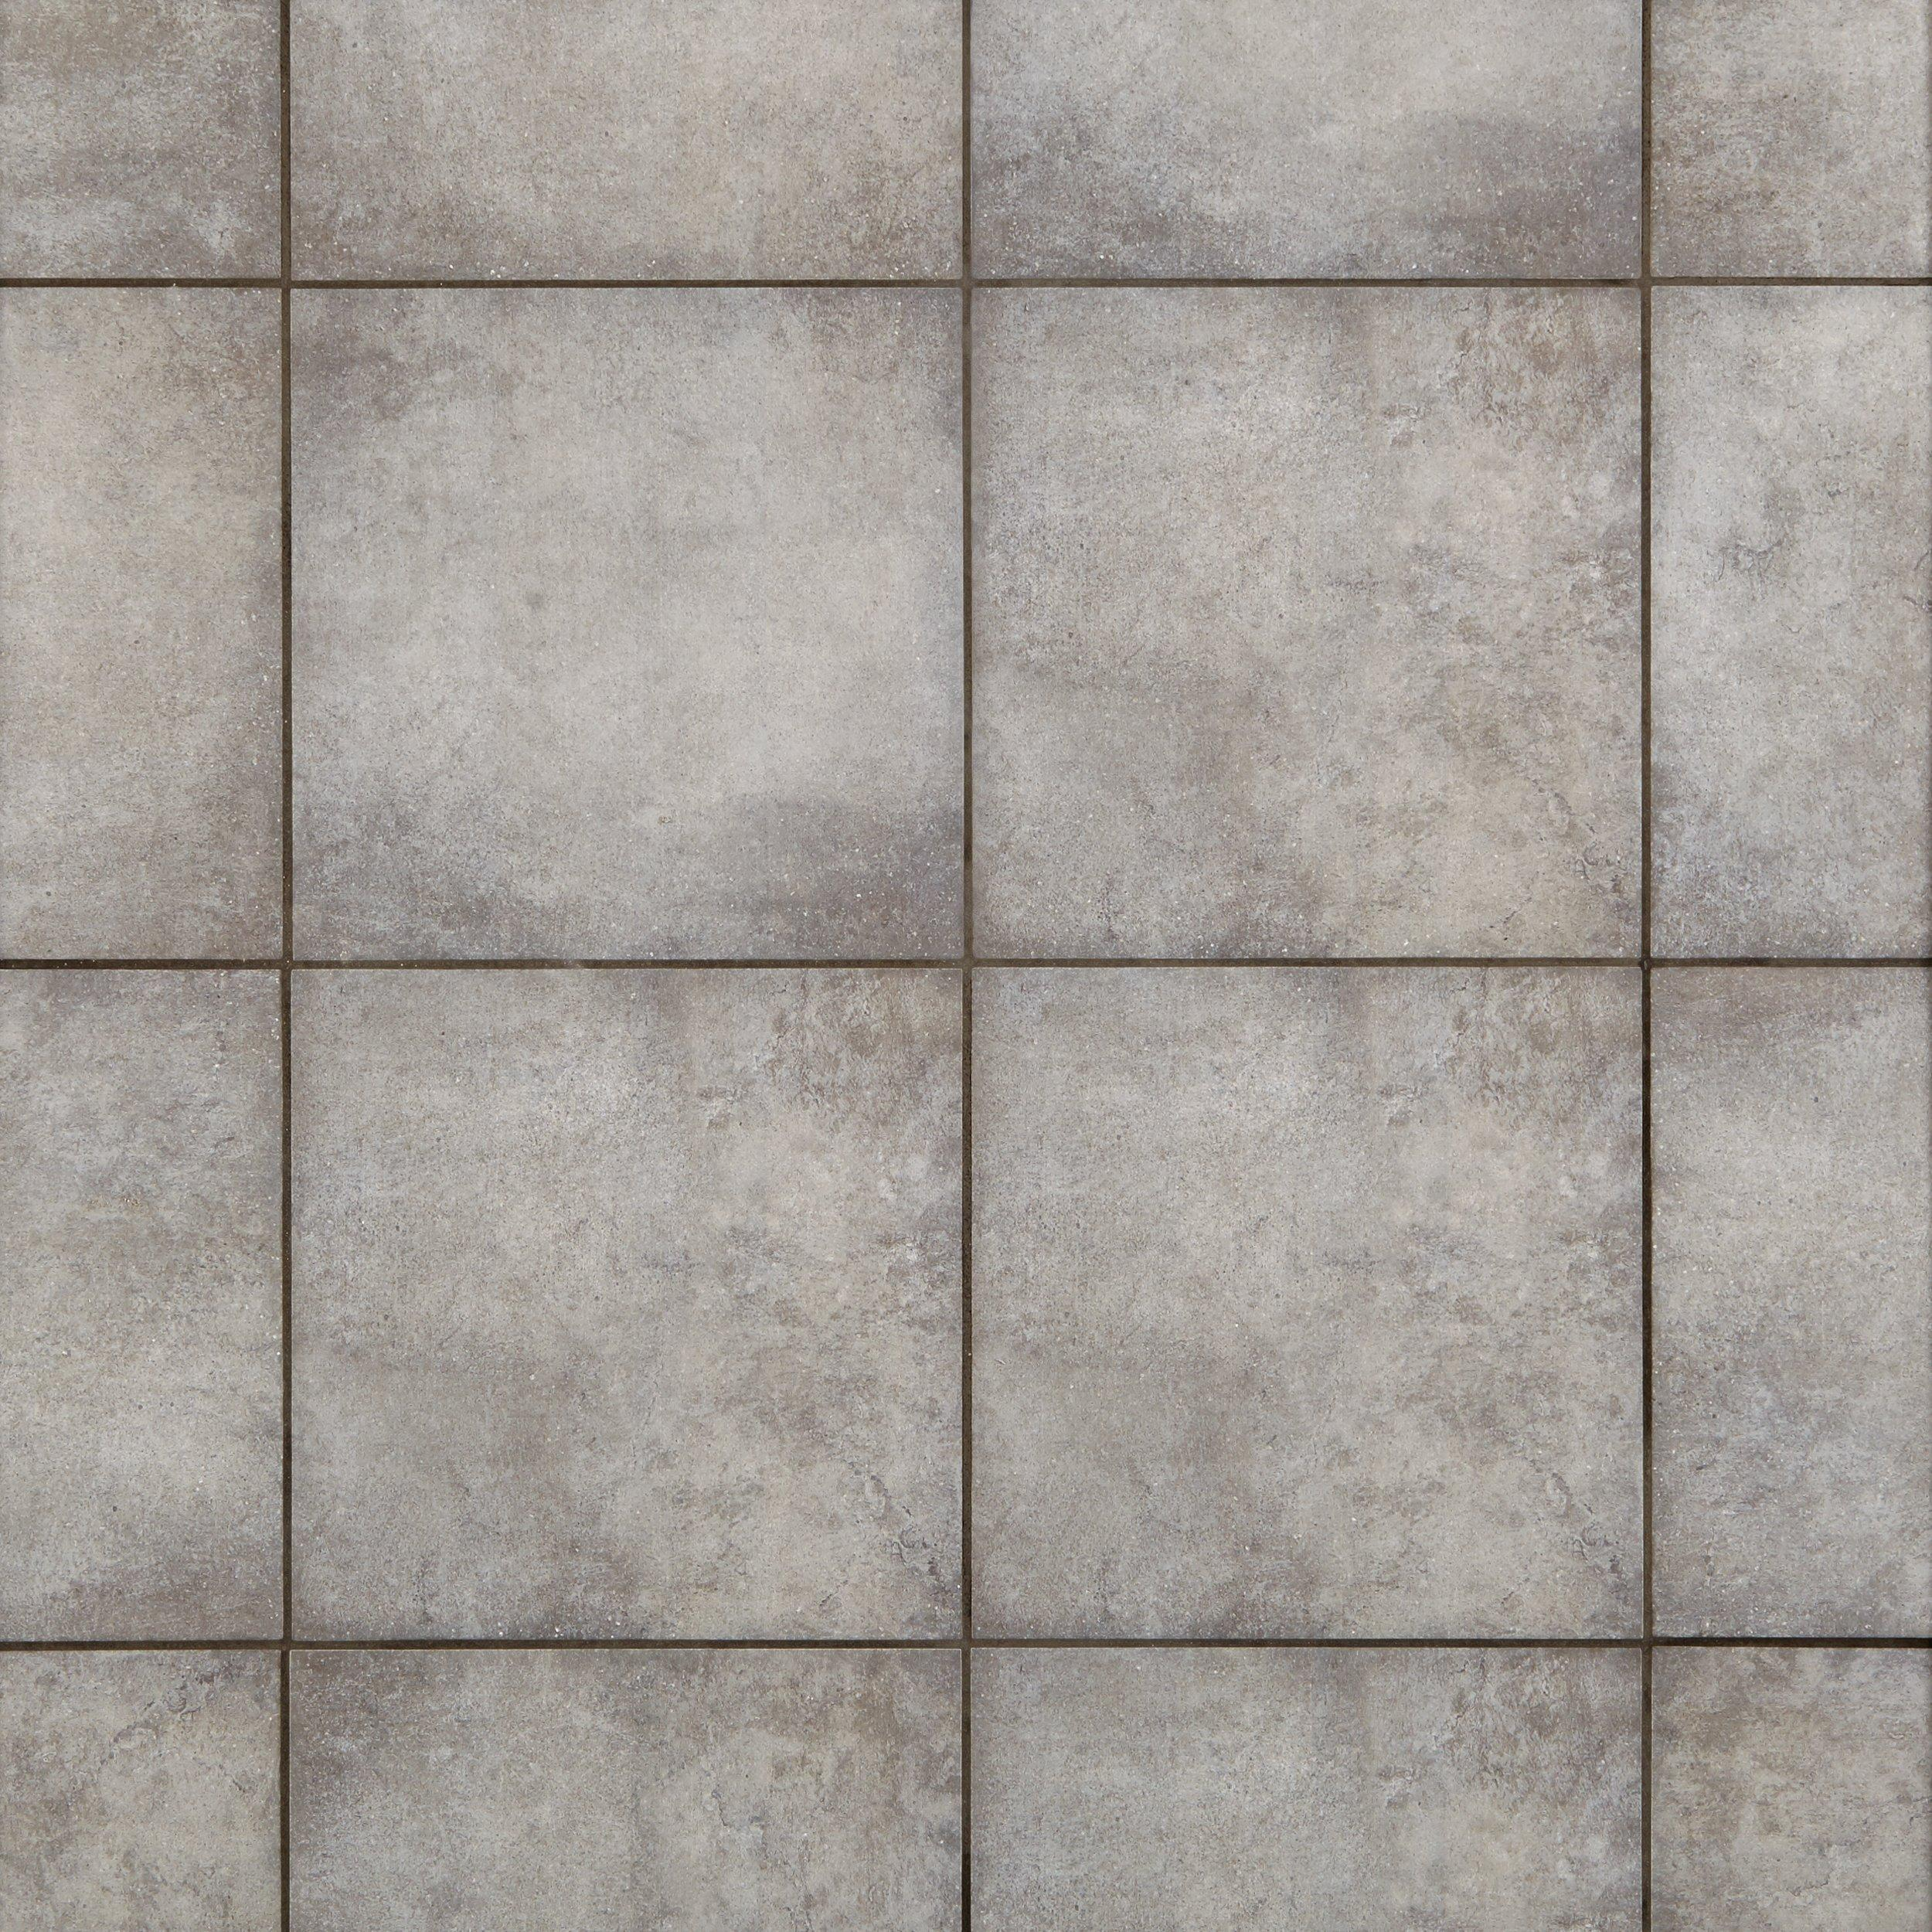 Genial Tulsa Gray Ceramic Tile